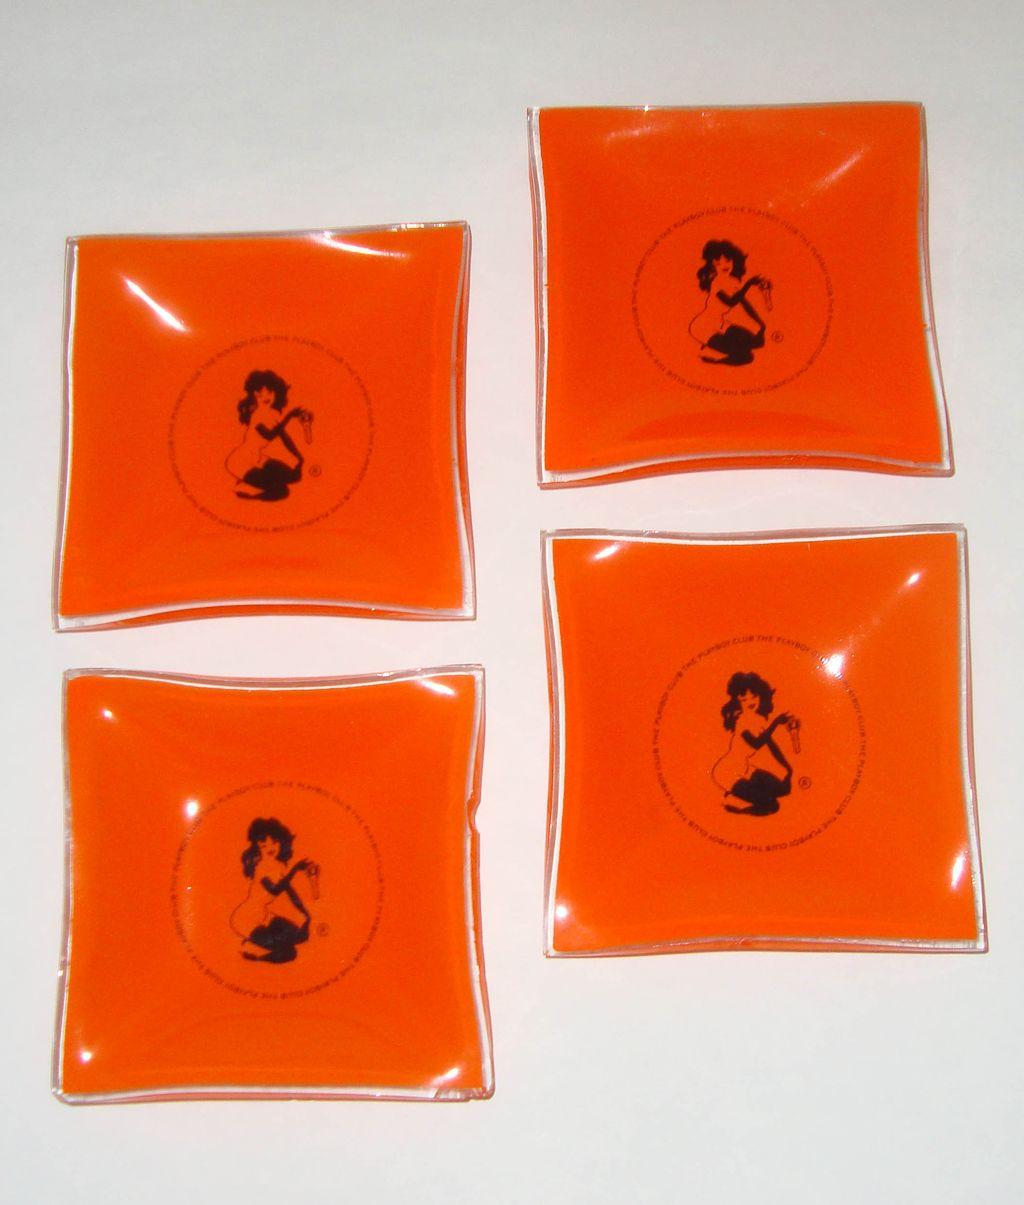 "Vintage Playboy Club Orange-Glass ""Femlin"" Ashtray Set: Icon Designed by Leroy Neiman"